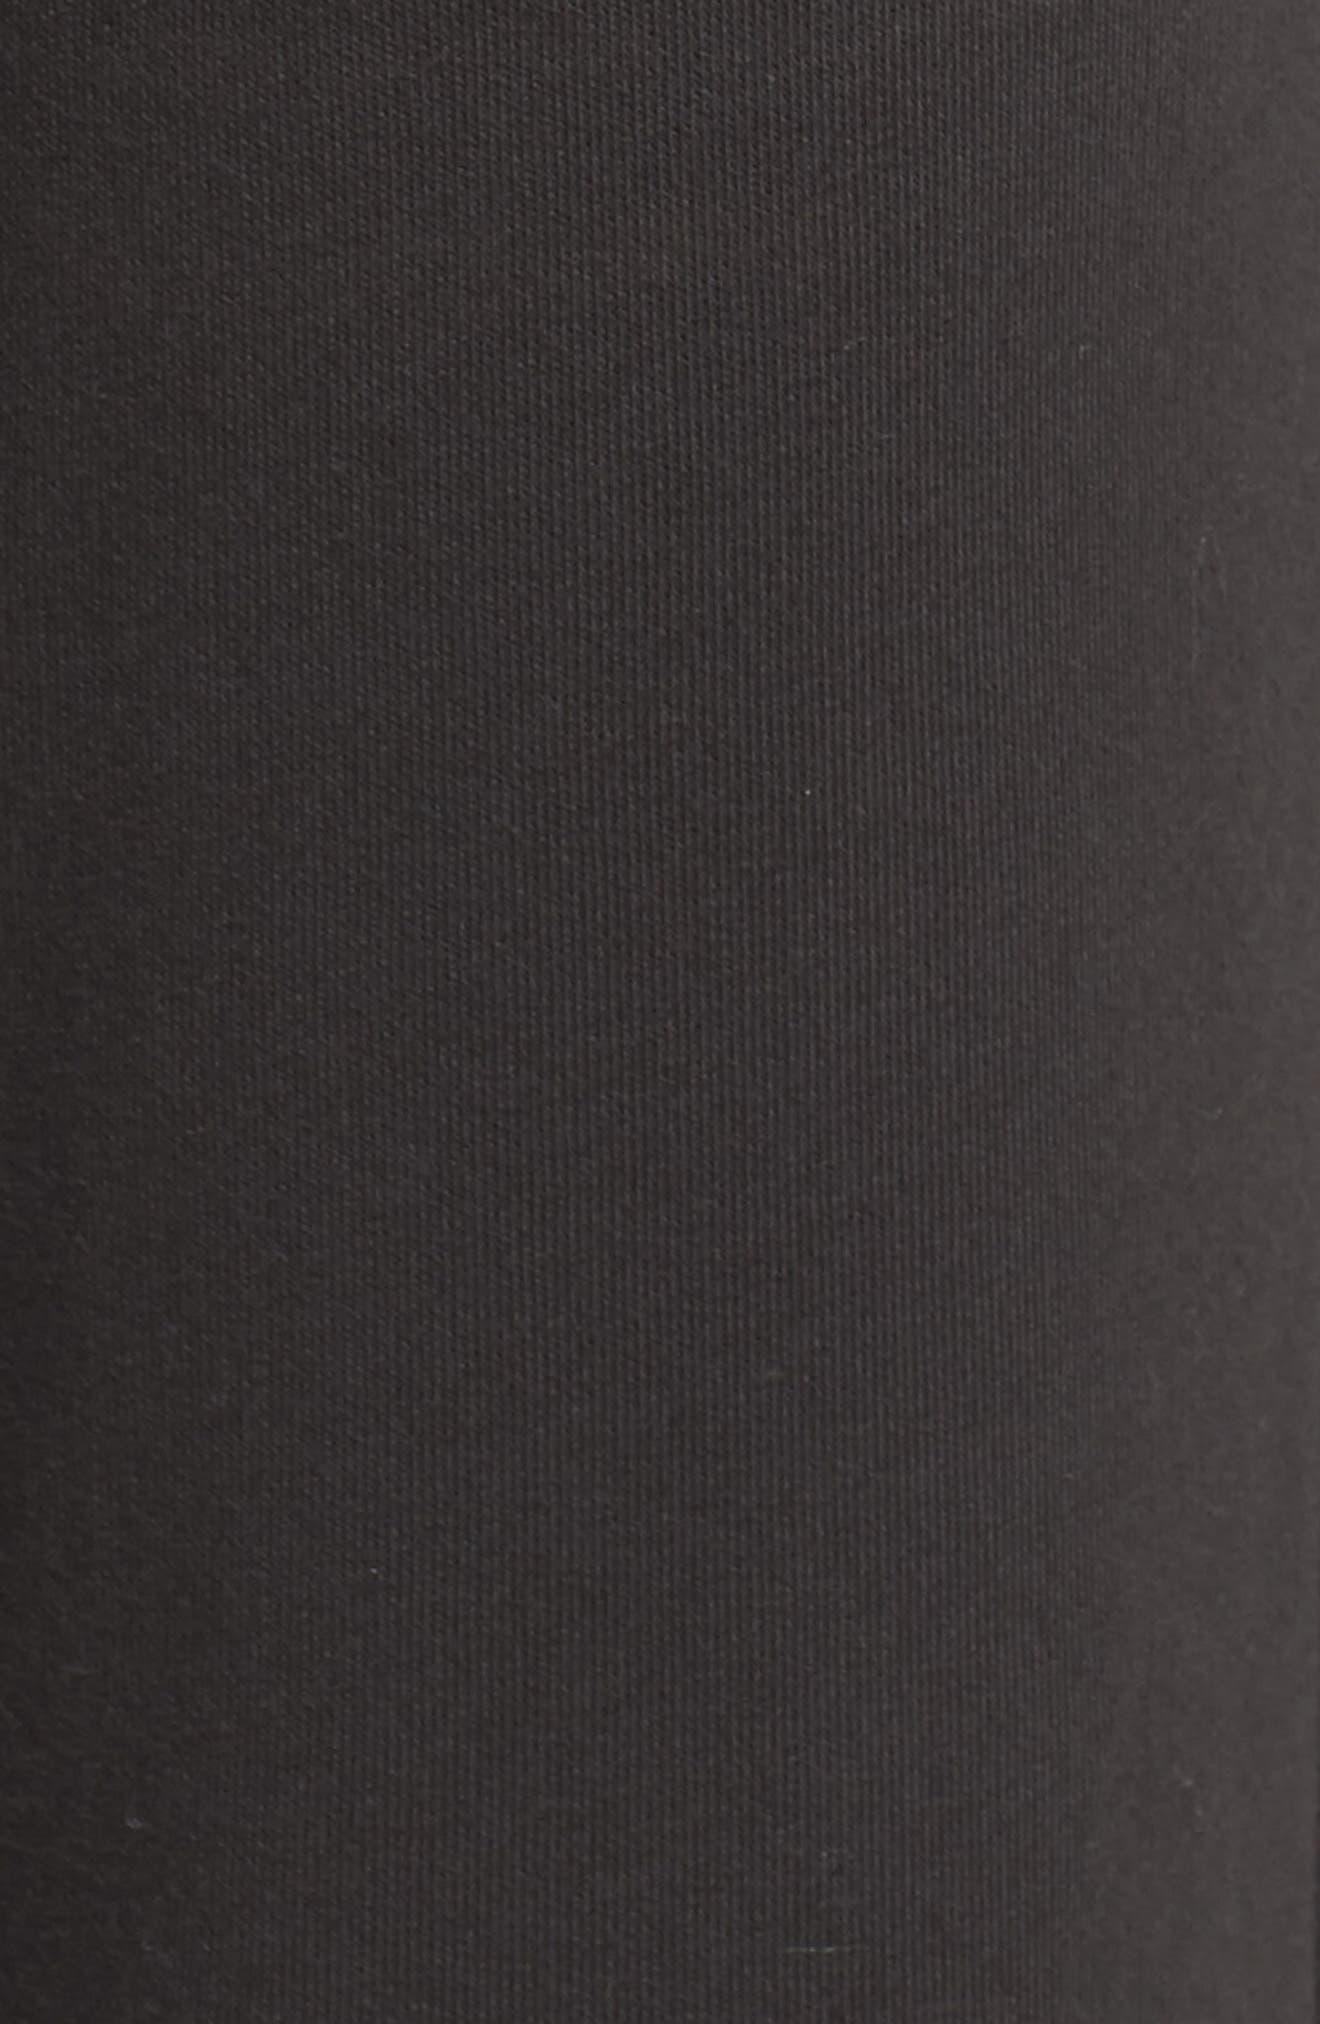 Lounge Jogger Pants,                             Alternate thumbnail 5, color,                             Black